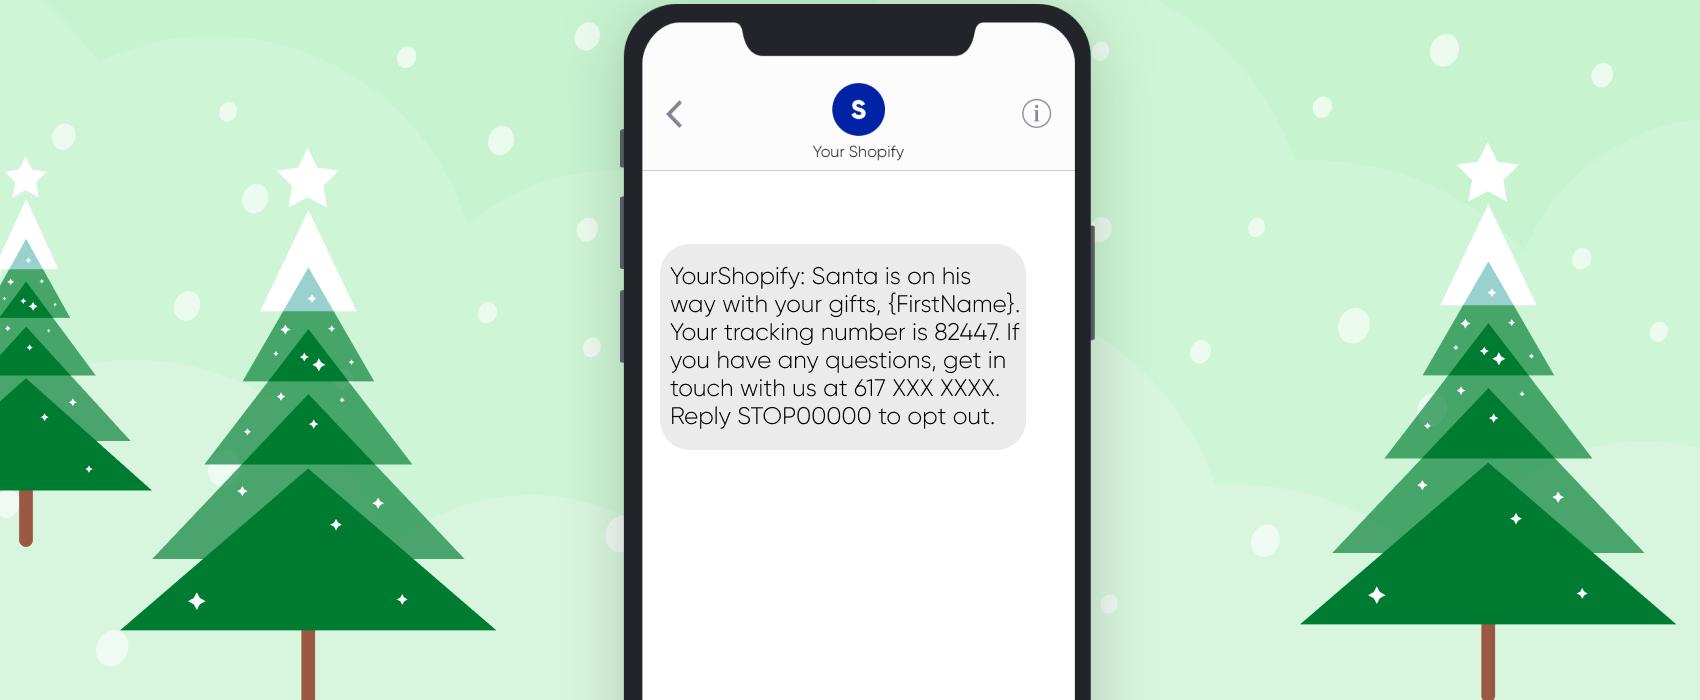 transaction_message_SMSBump